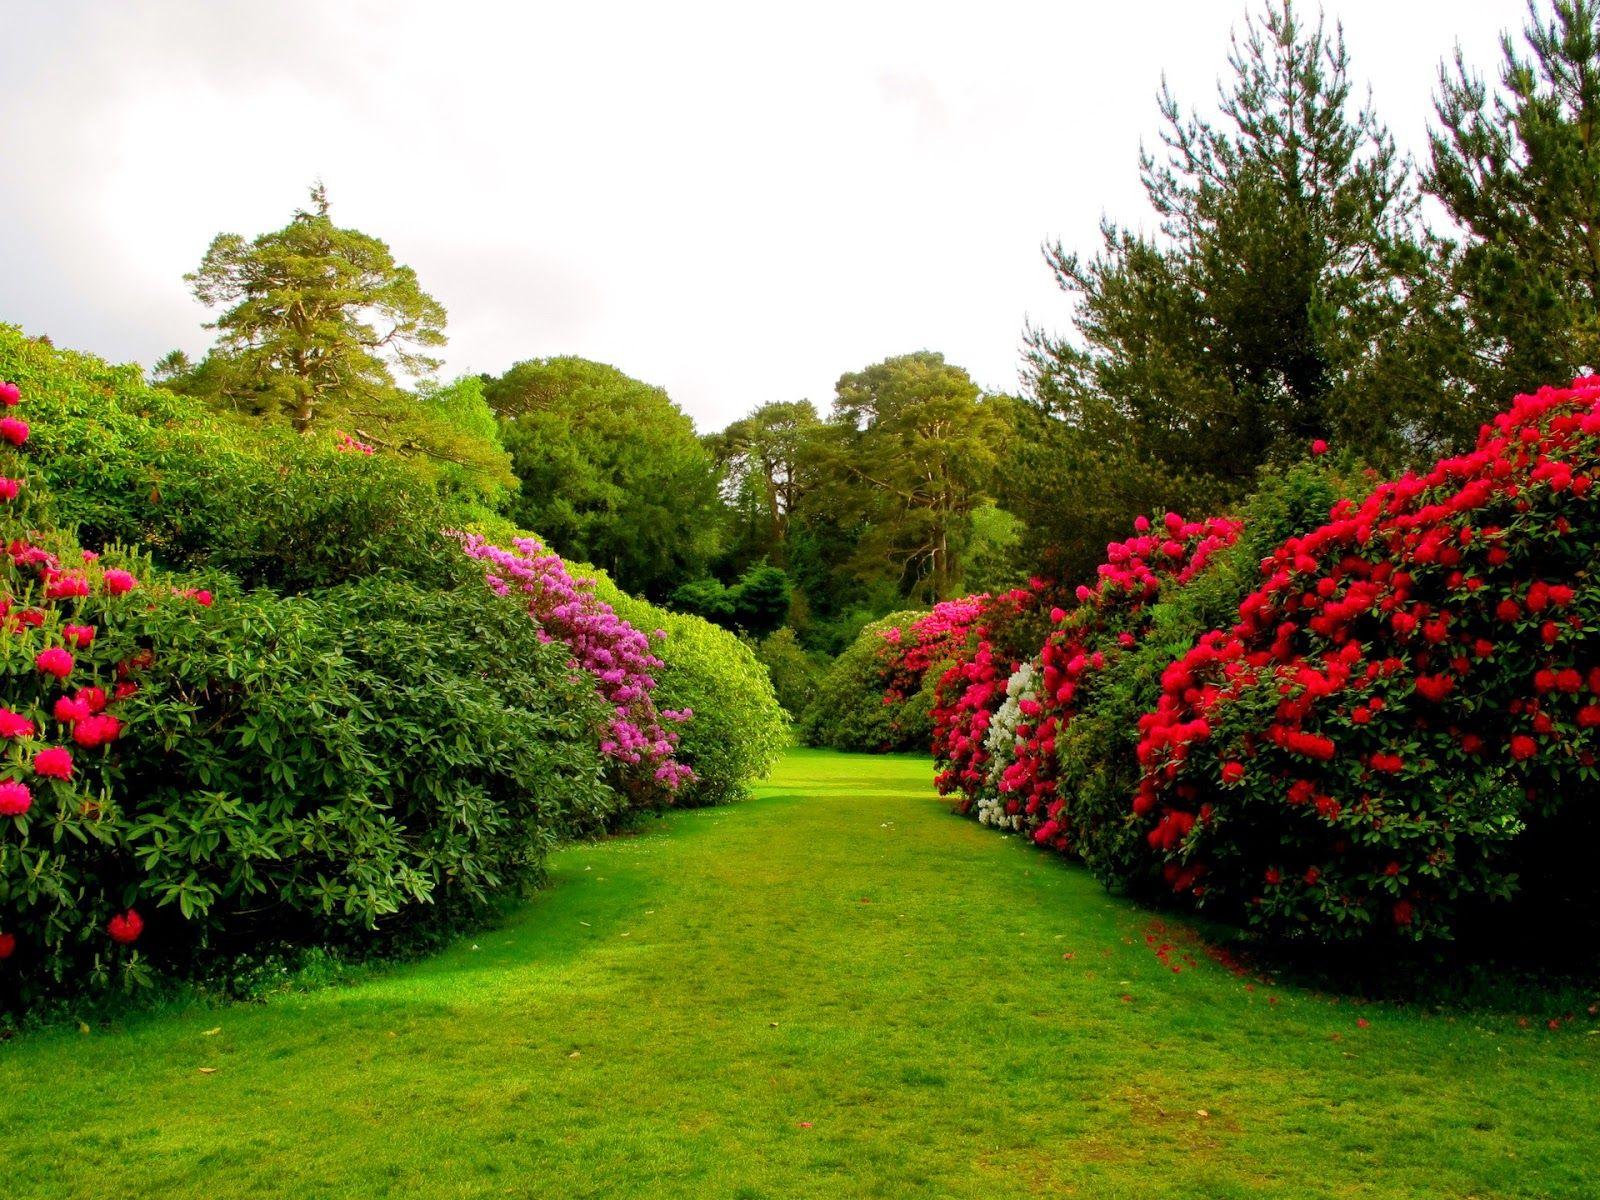 Nature Wallpapers Hd Best Beautiful Mix Beautiful Flowers Garden Garden Pictures Flower Garden Pictures